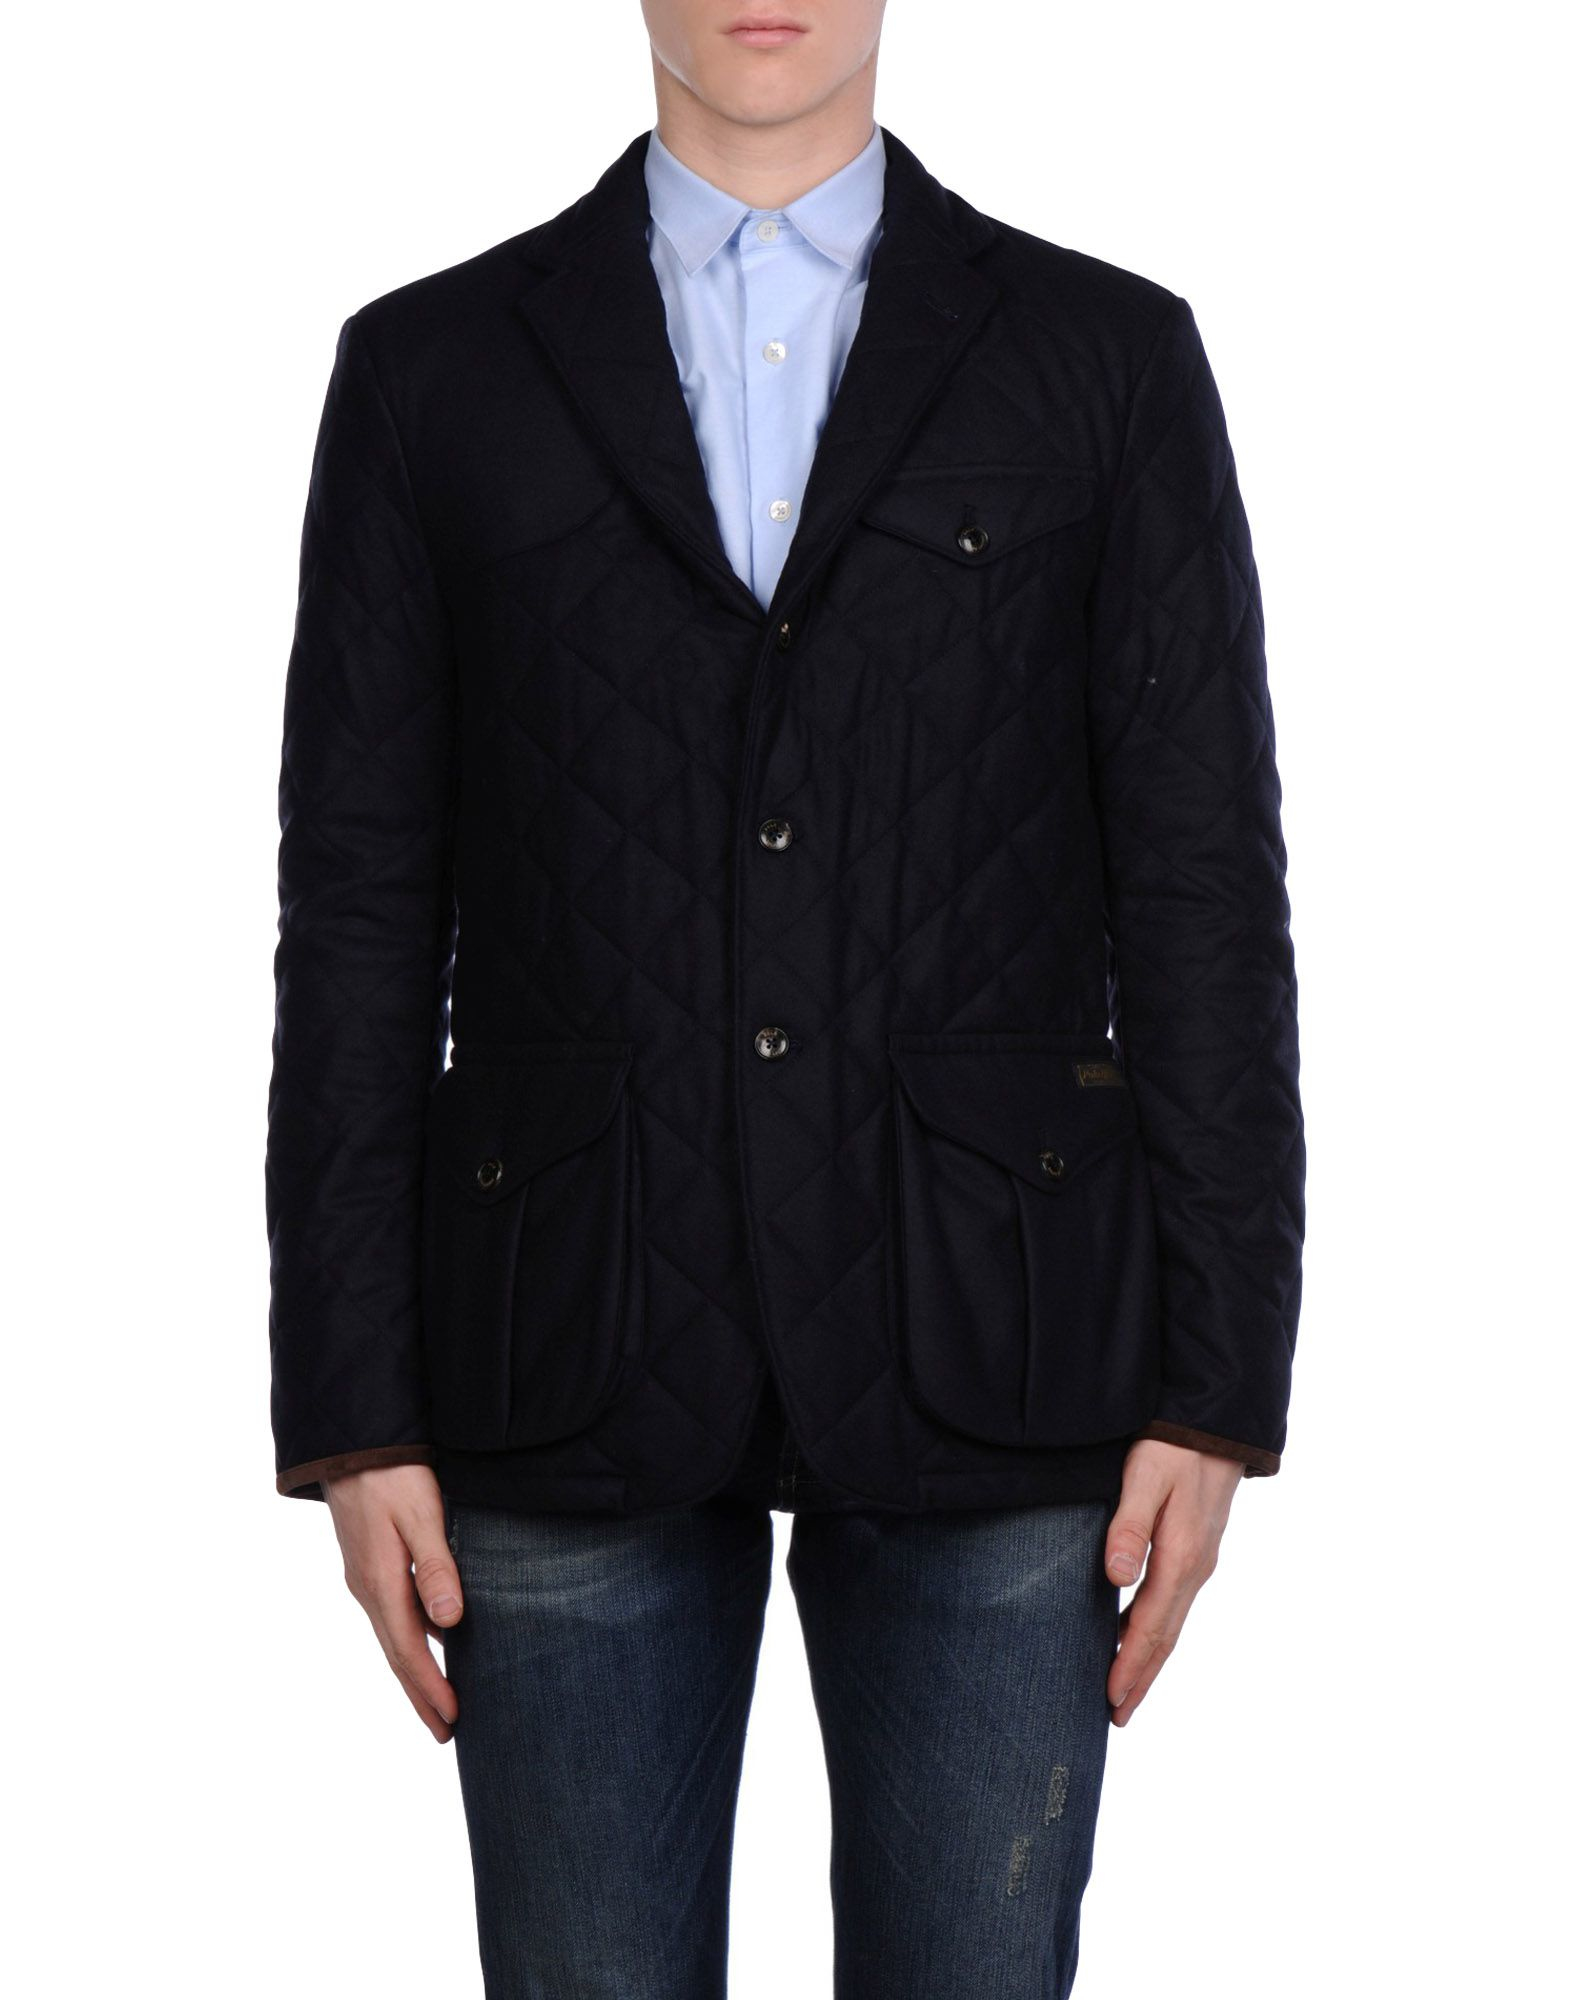 polo ralph lauren blazer in blue for men dark blue lyst. Black Bedroom Furniture Sets. Home Design Ideas